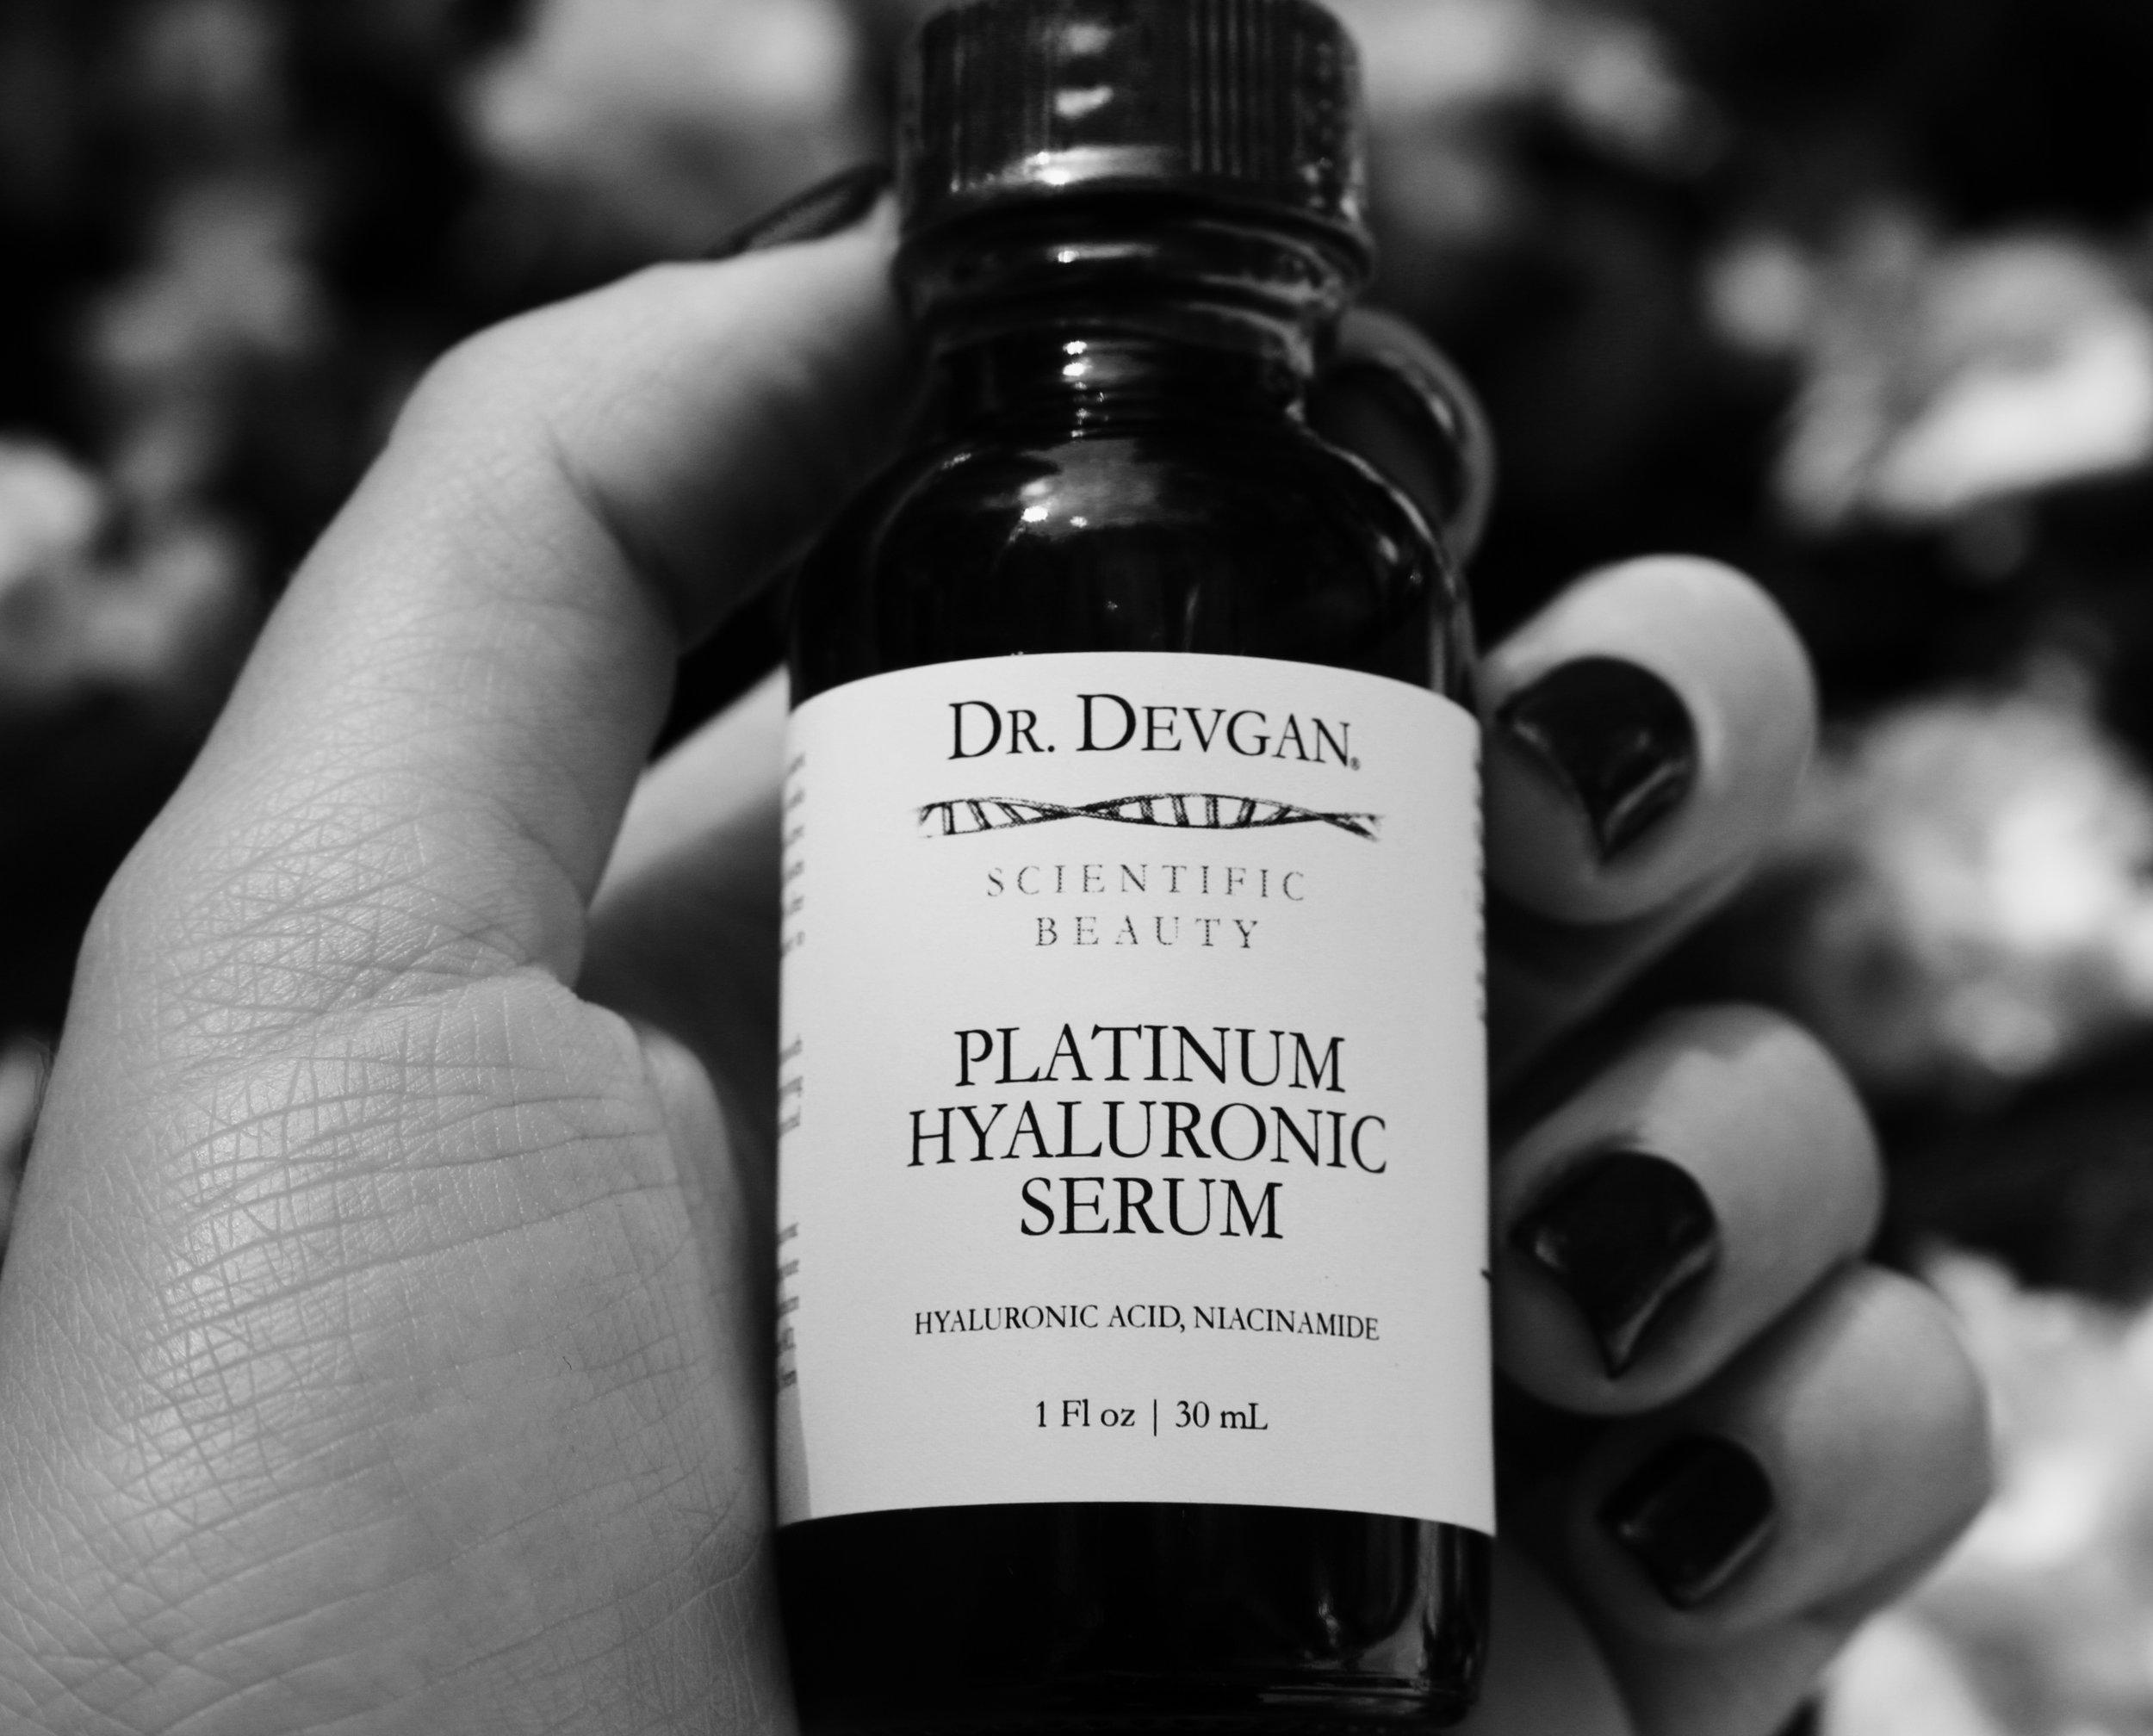 Scientific Beauty's Platinum Hyaluronic Serum